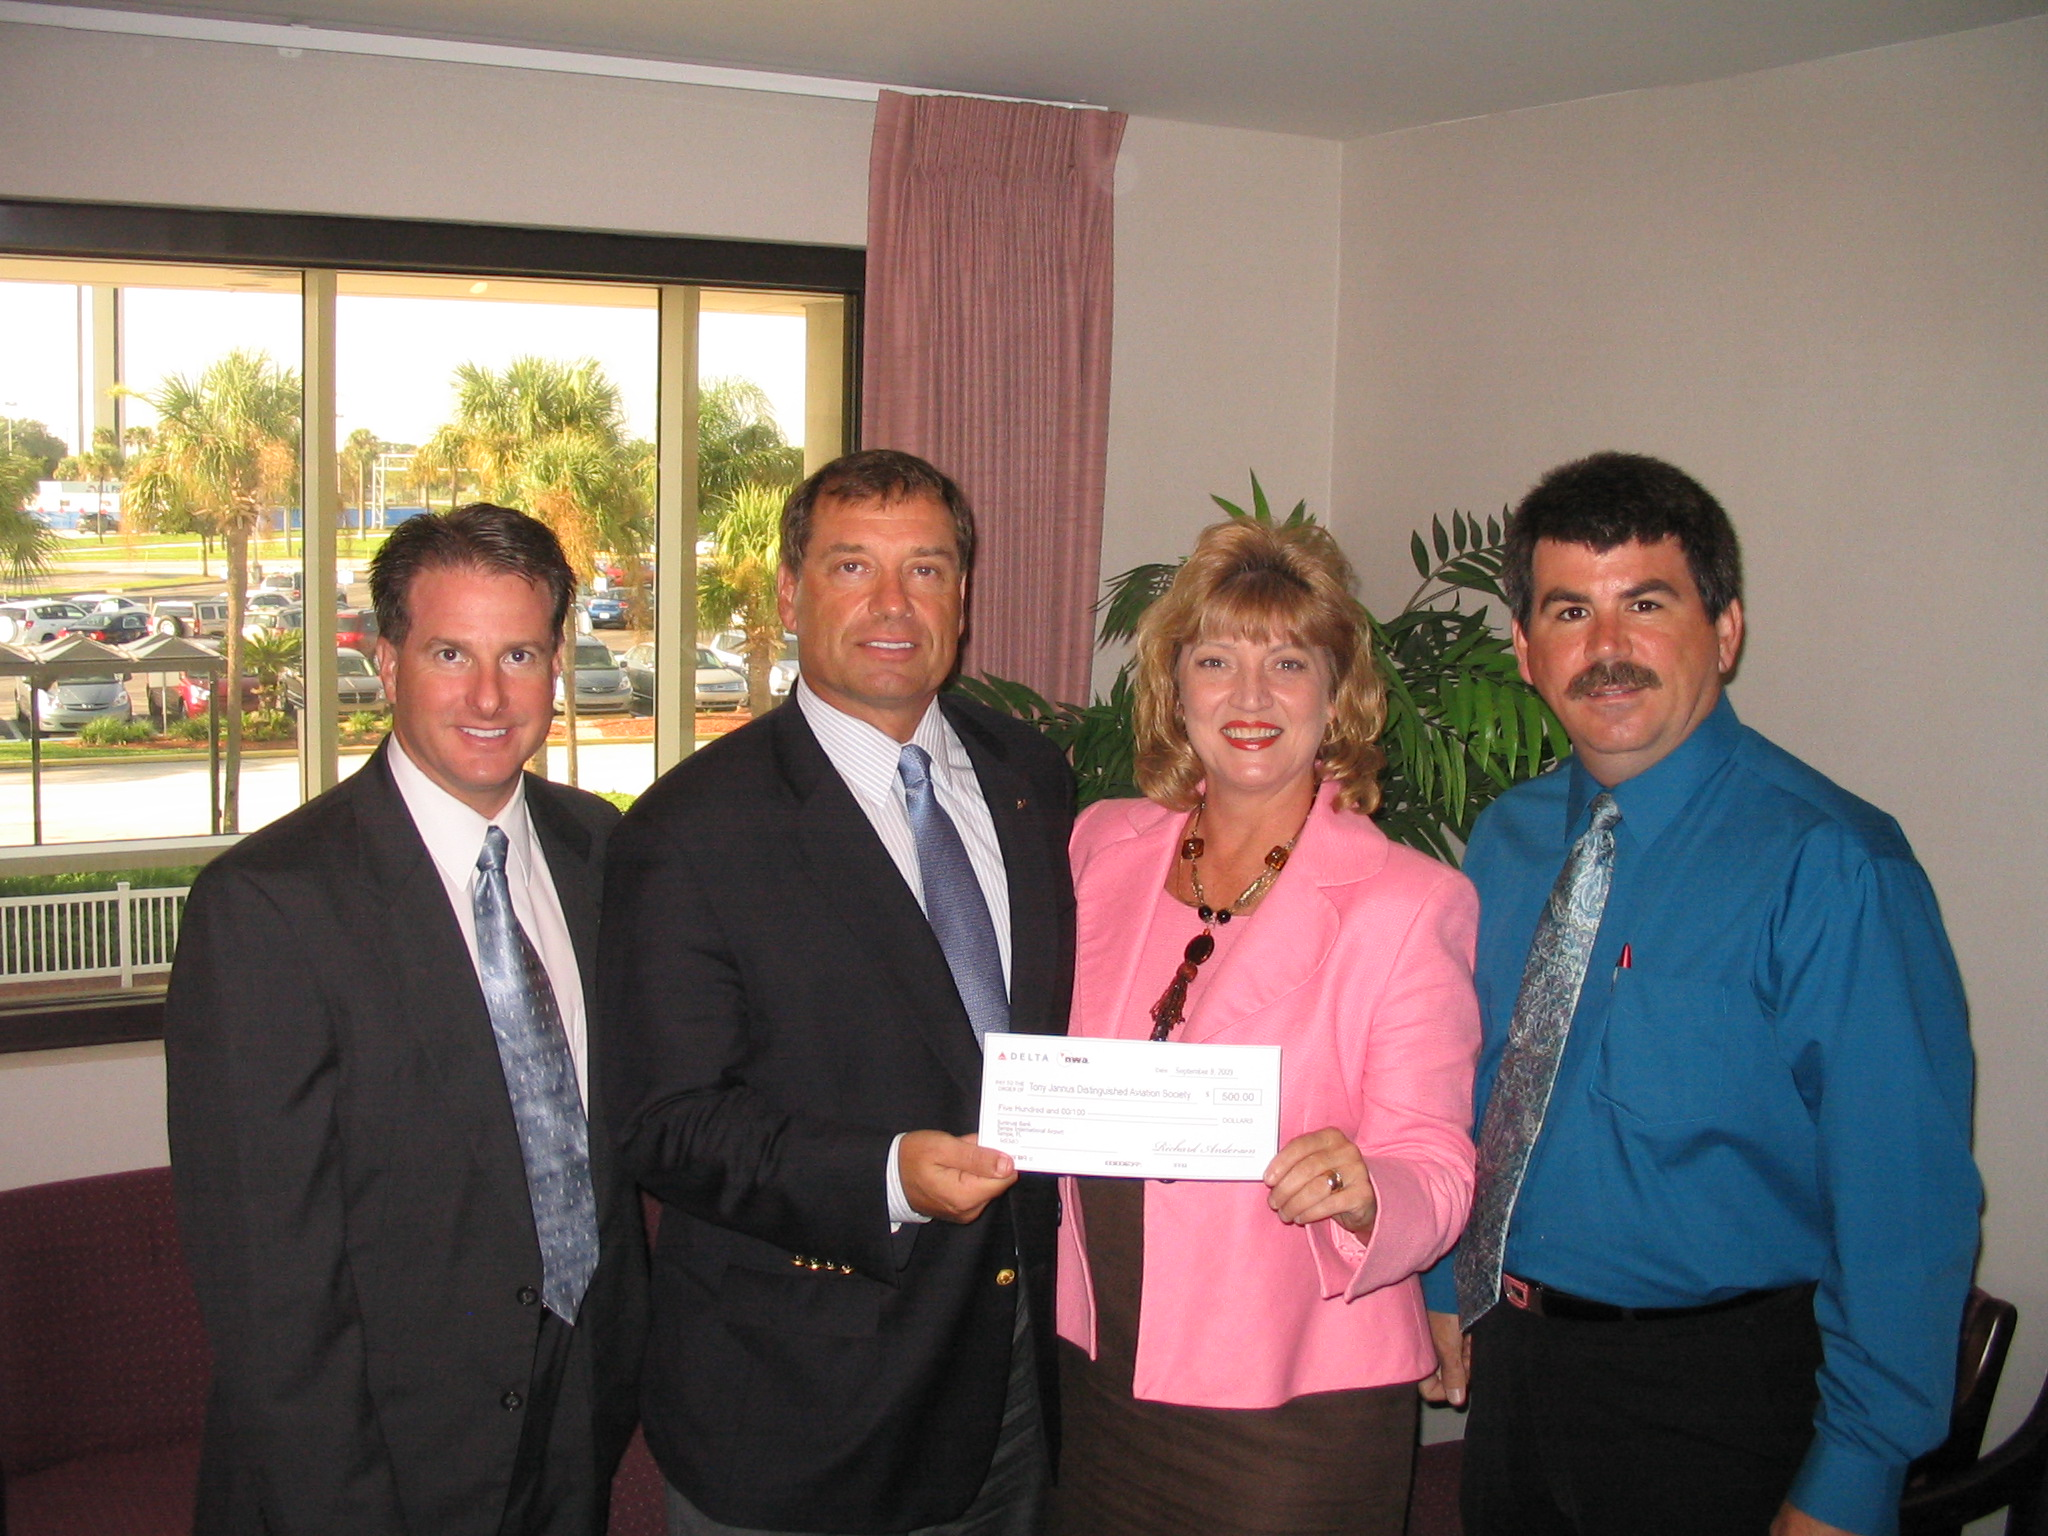 Robert Bohan presenting check to Colleen and Tanker, 8 Sep '09.JPG